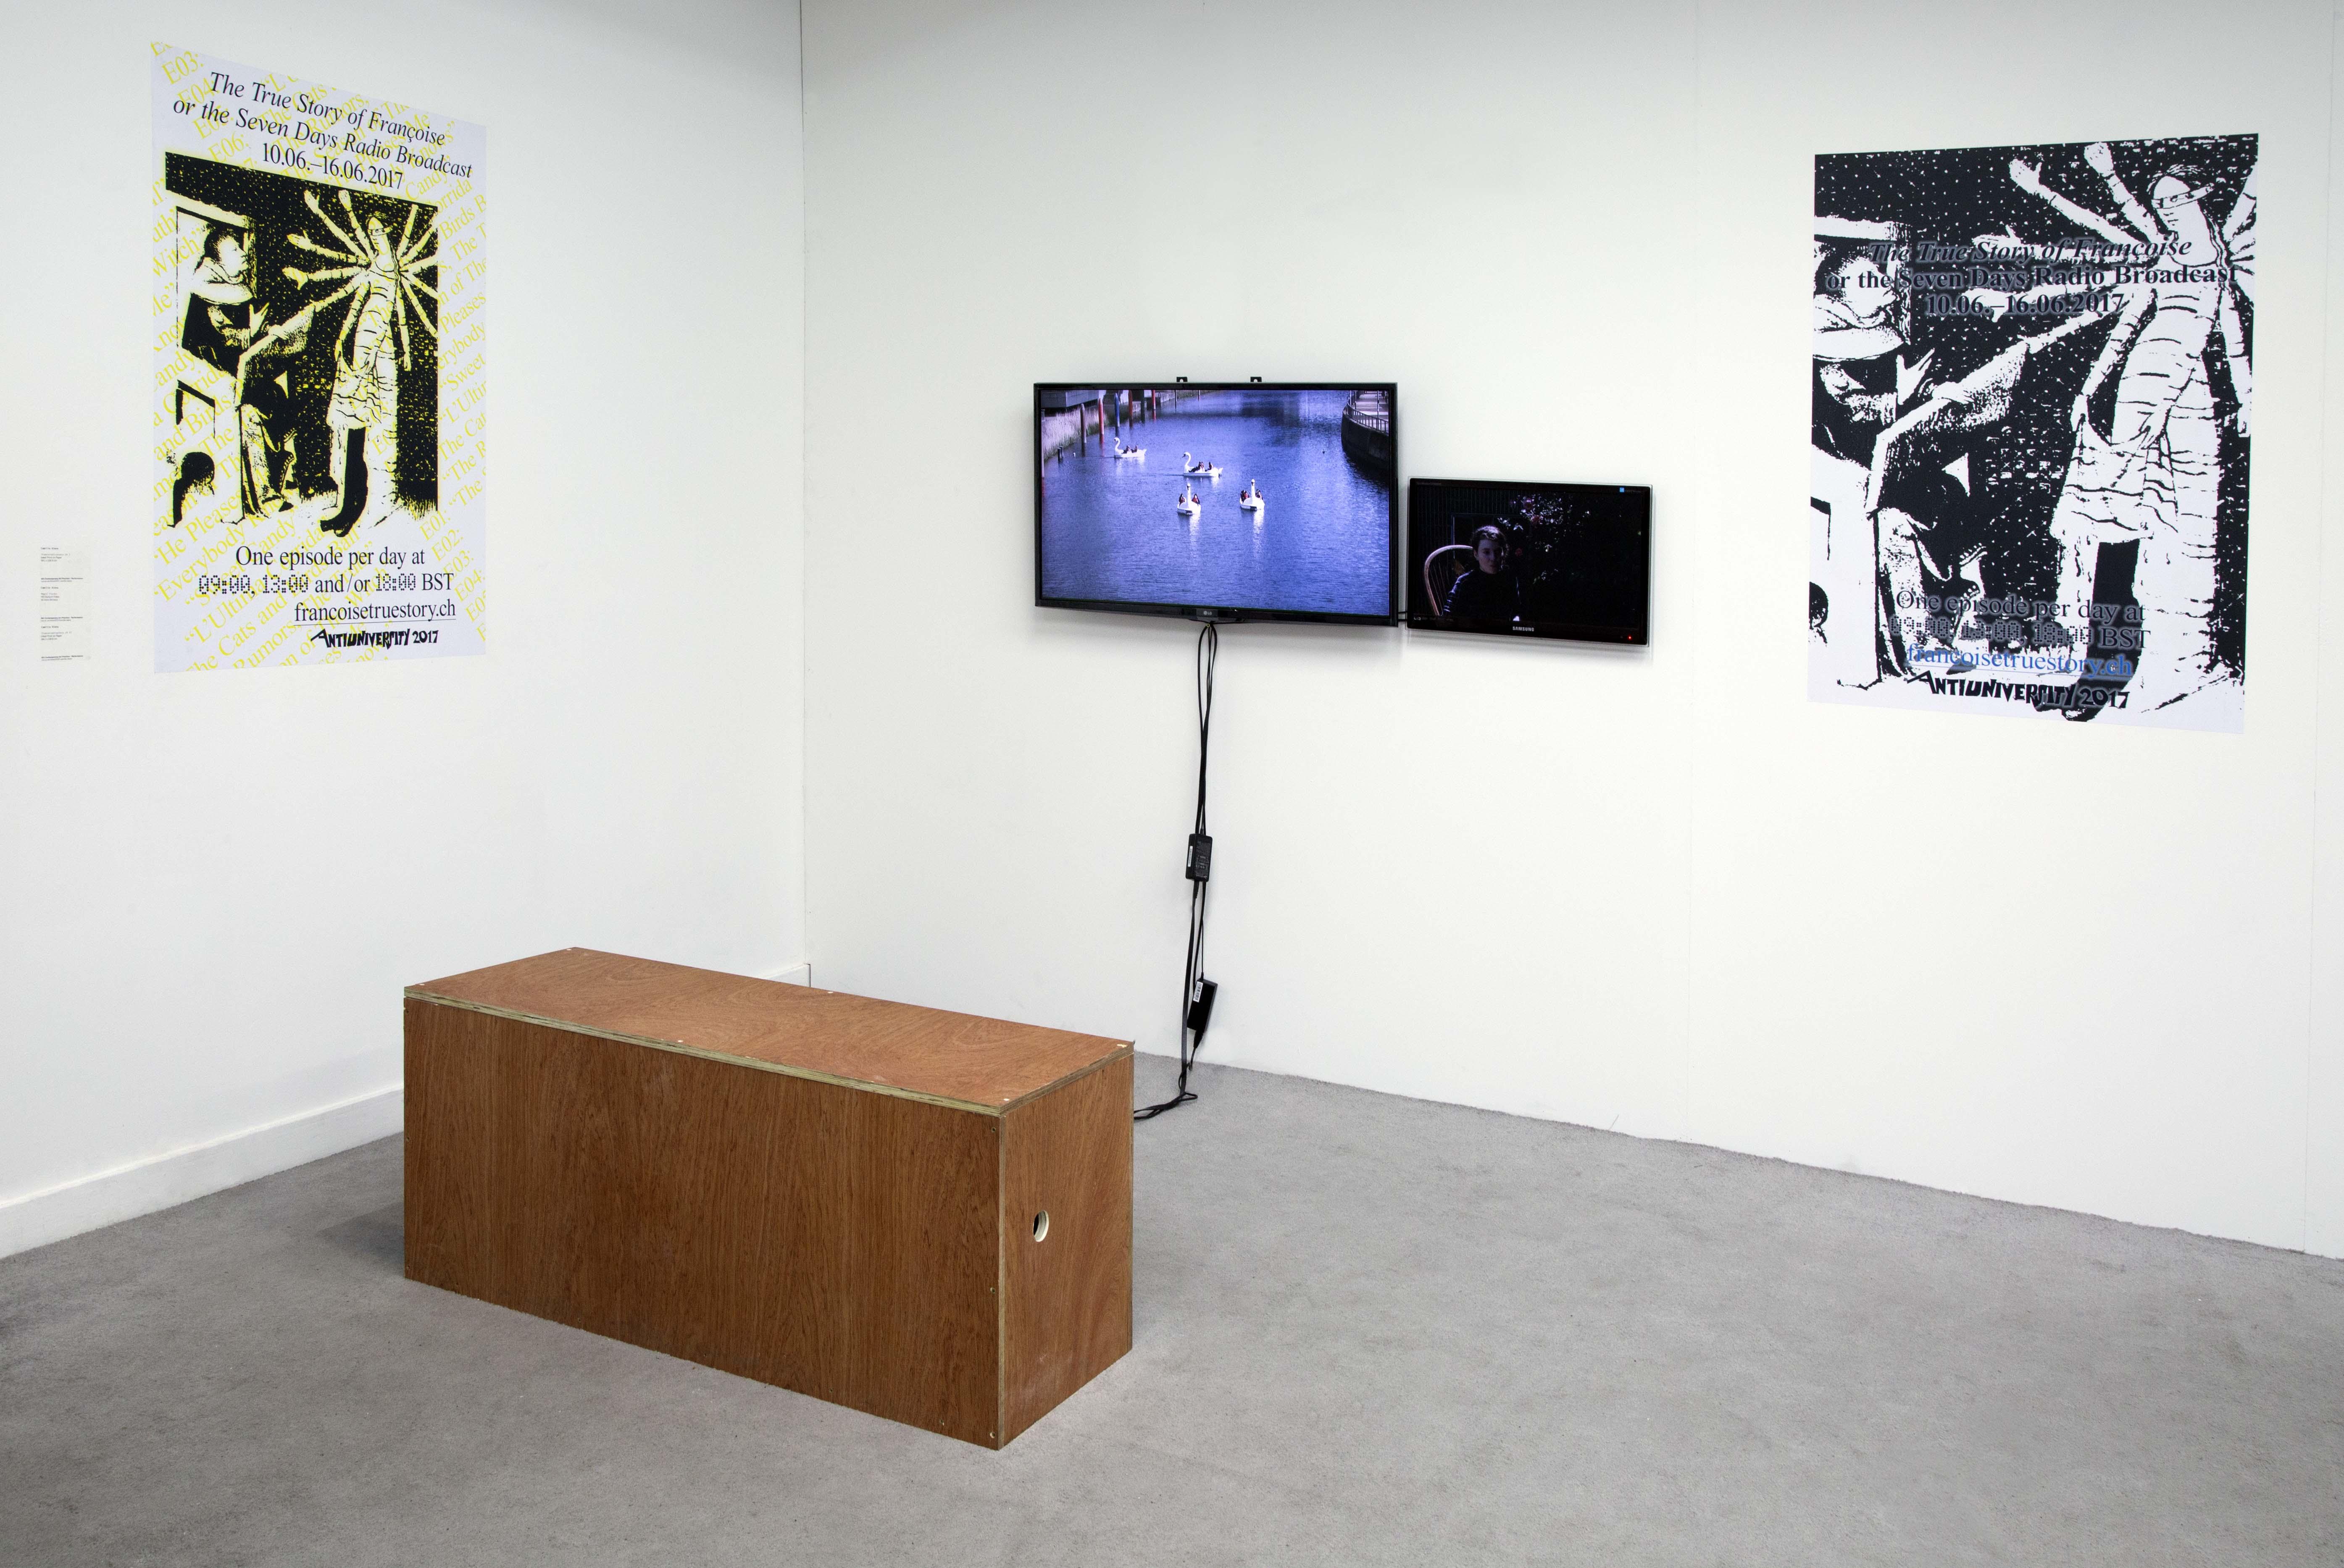 camille-alena_royal-college-of-art_installationsview.jpg